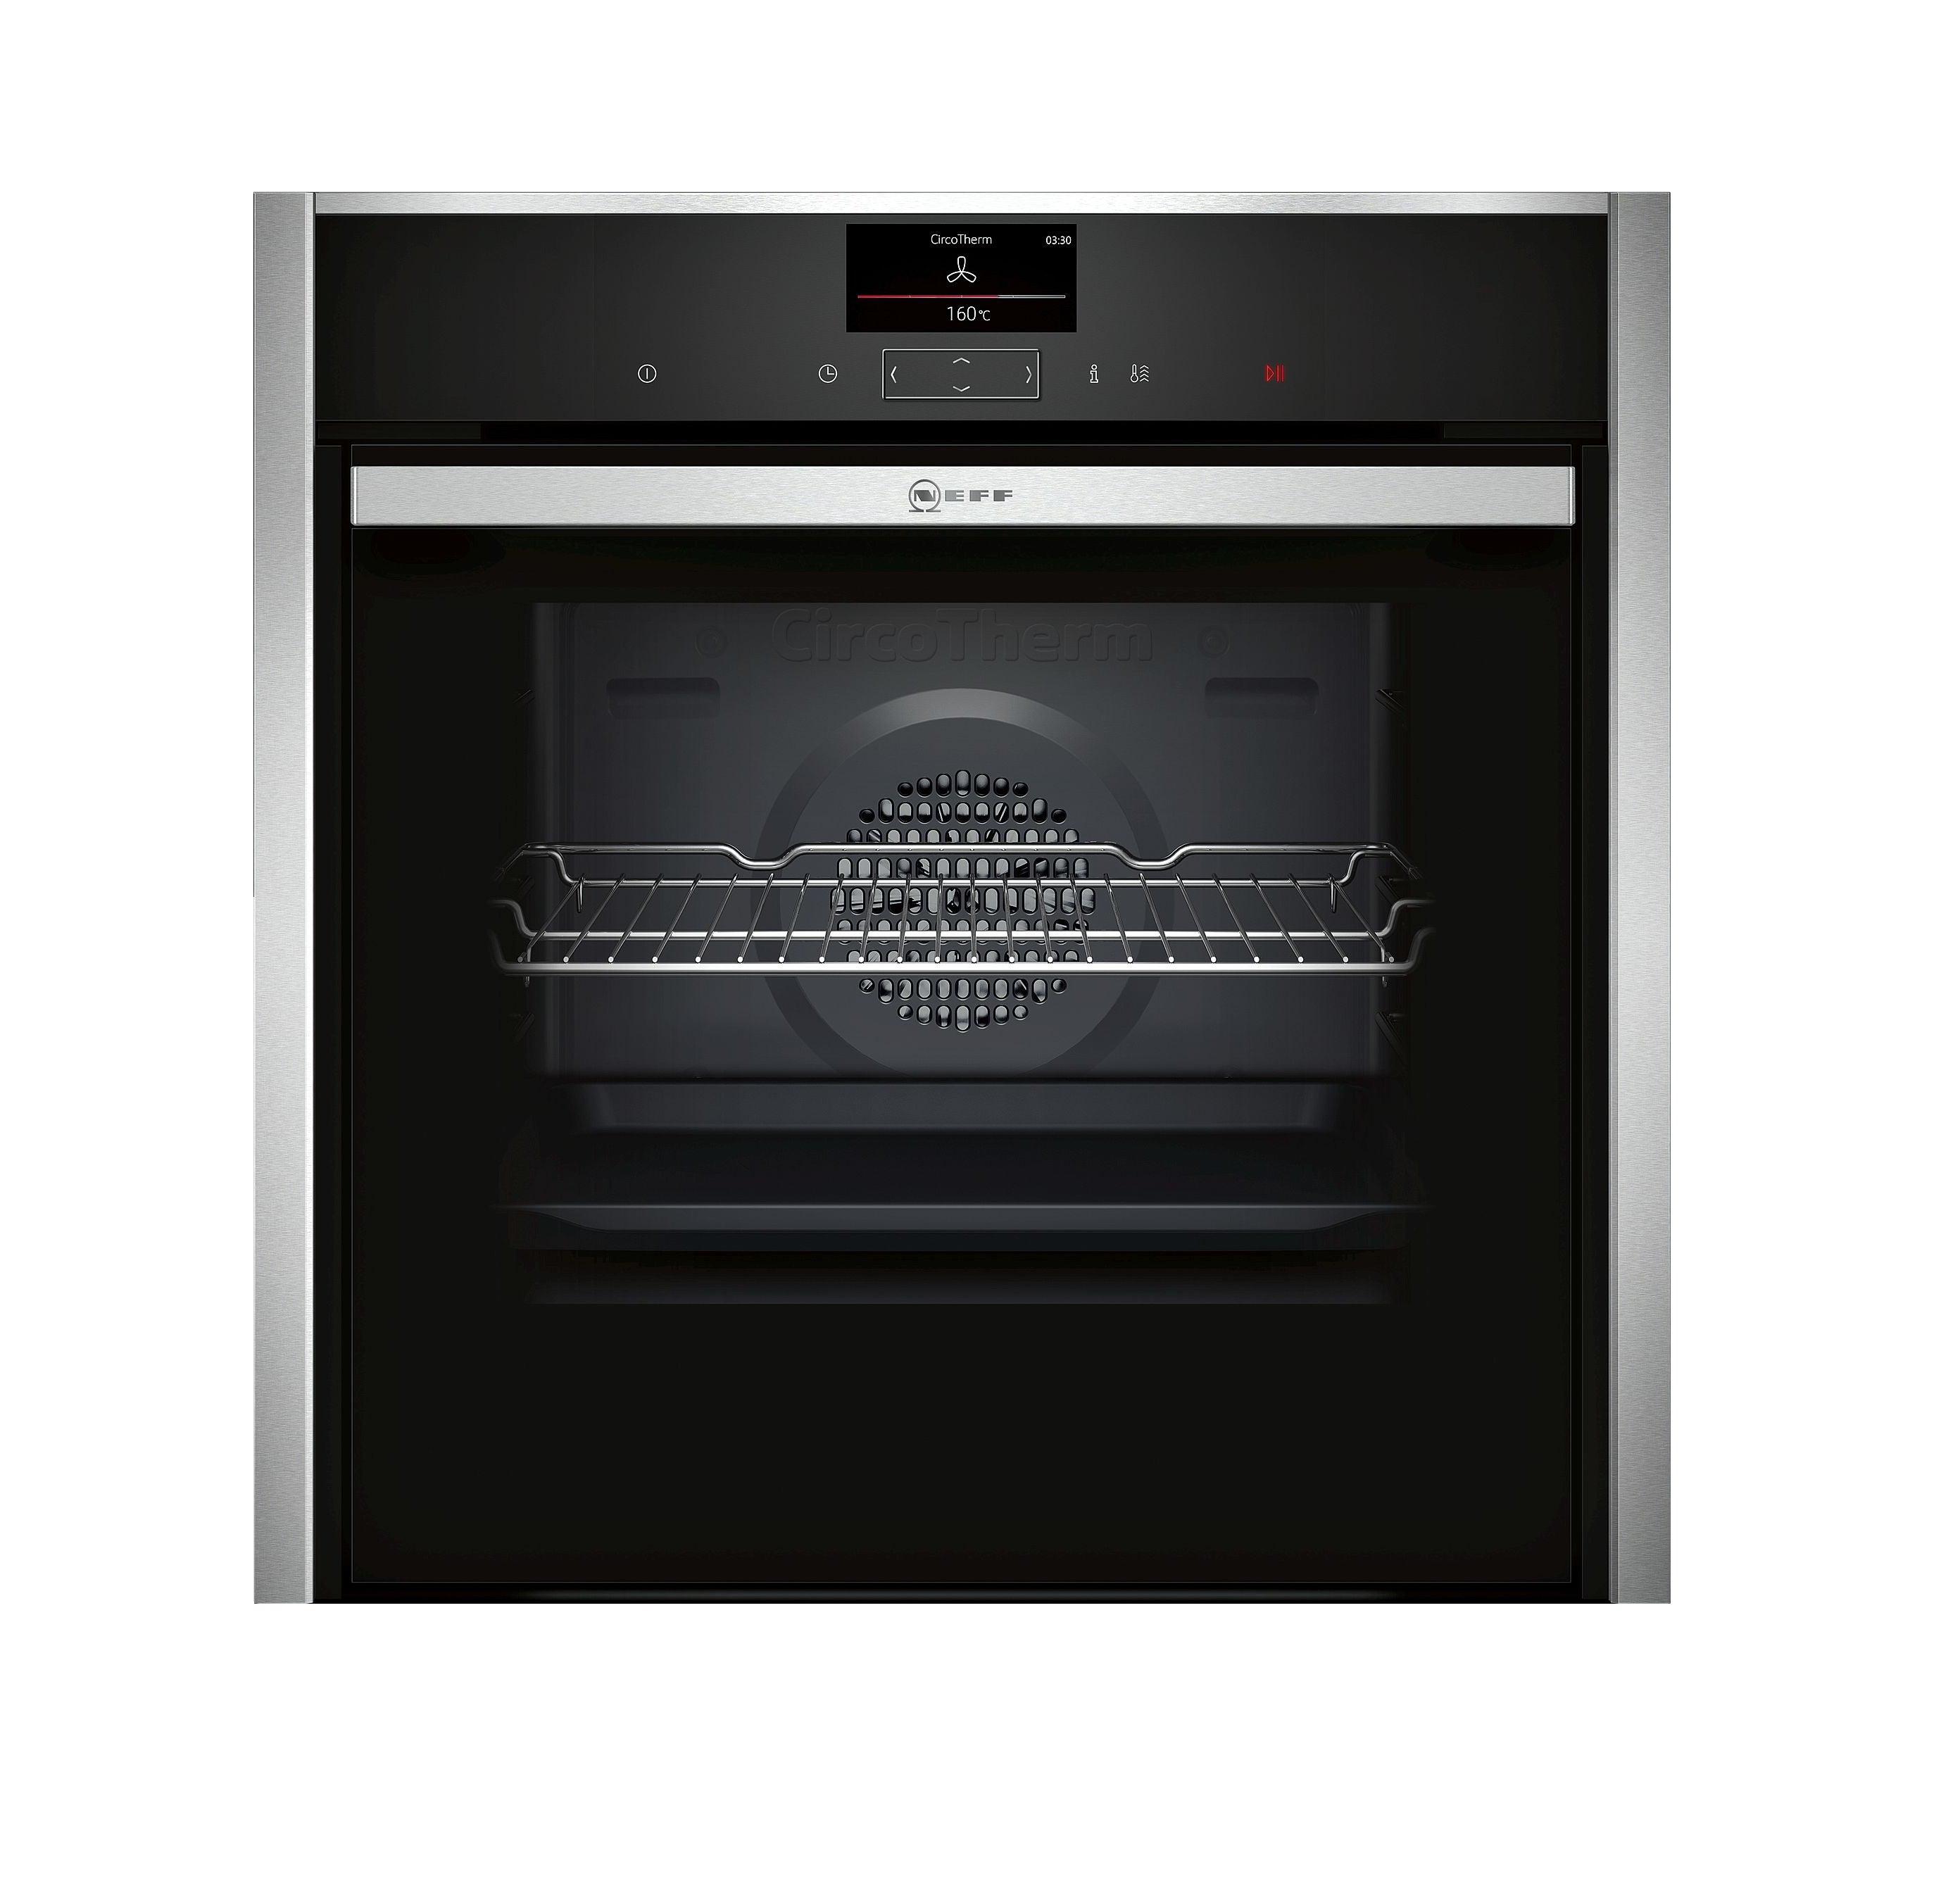 Neff B57CR22N0 Oven